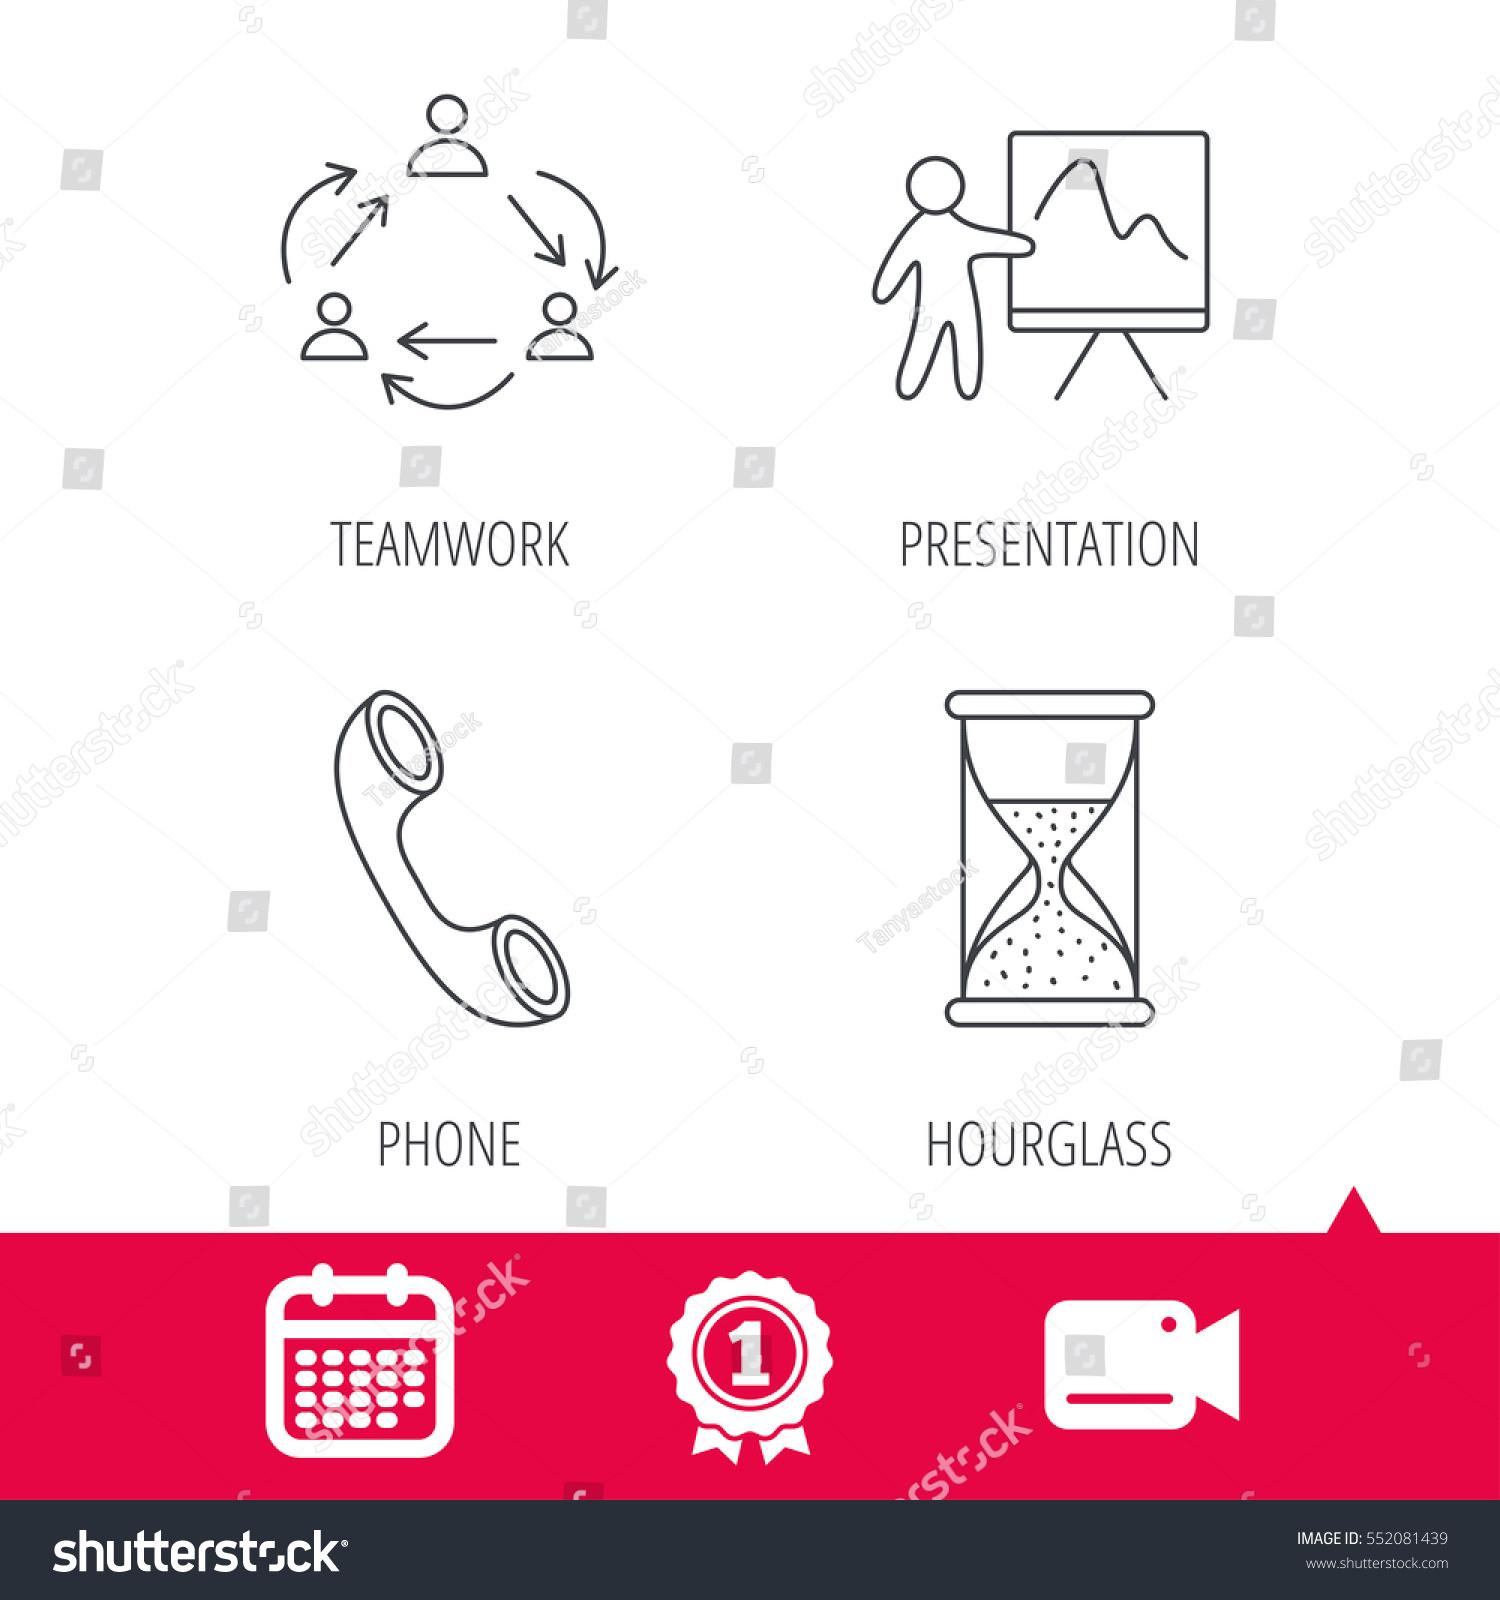 teamwork presentation